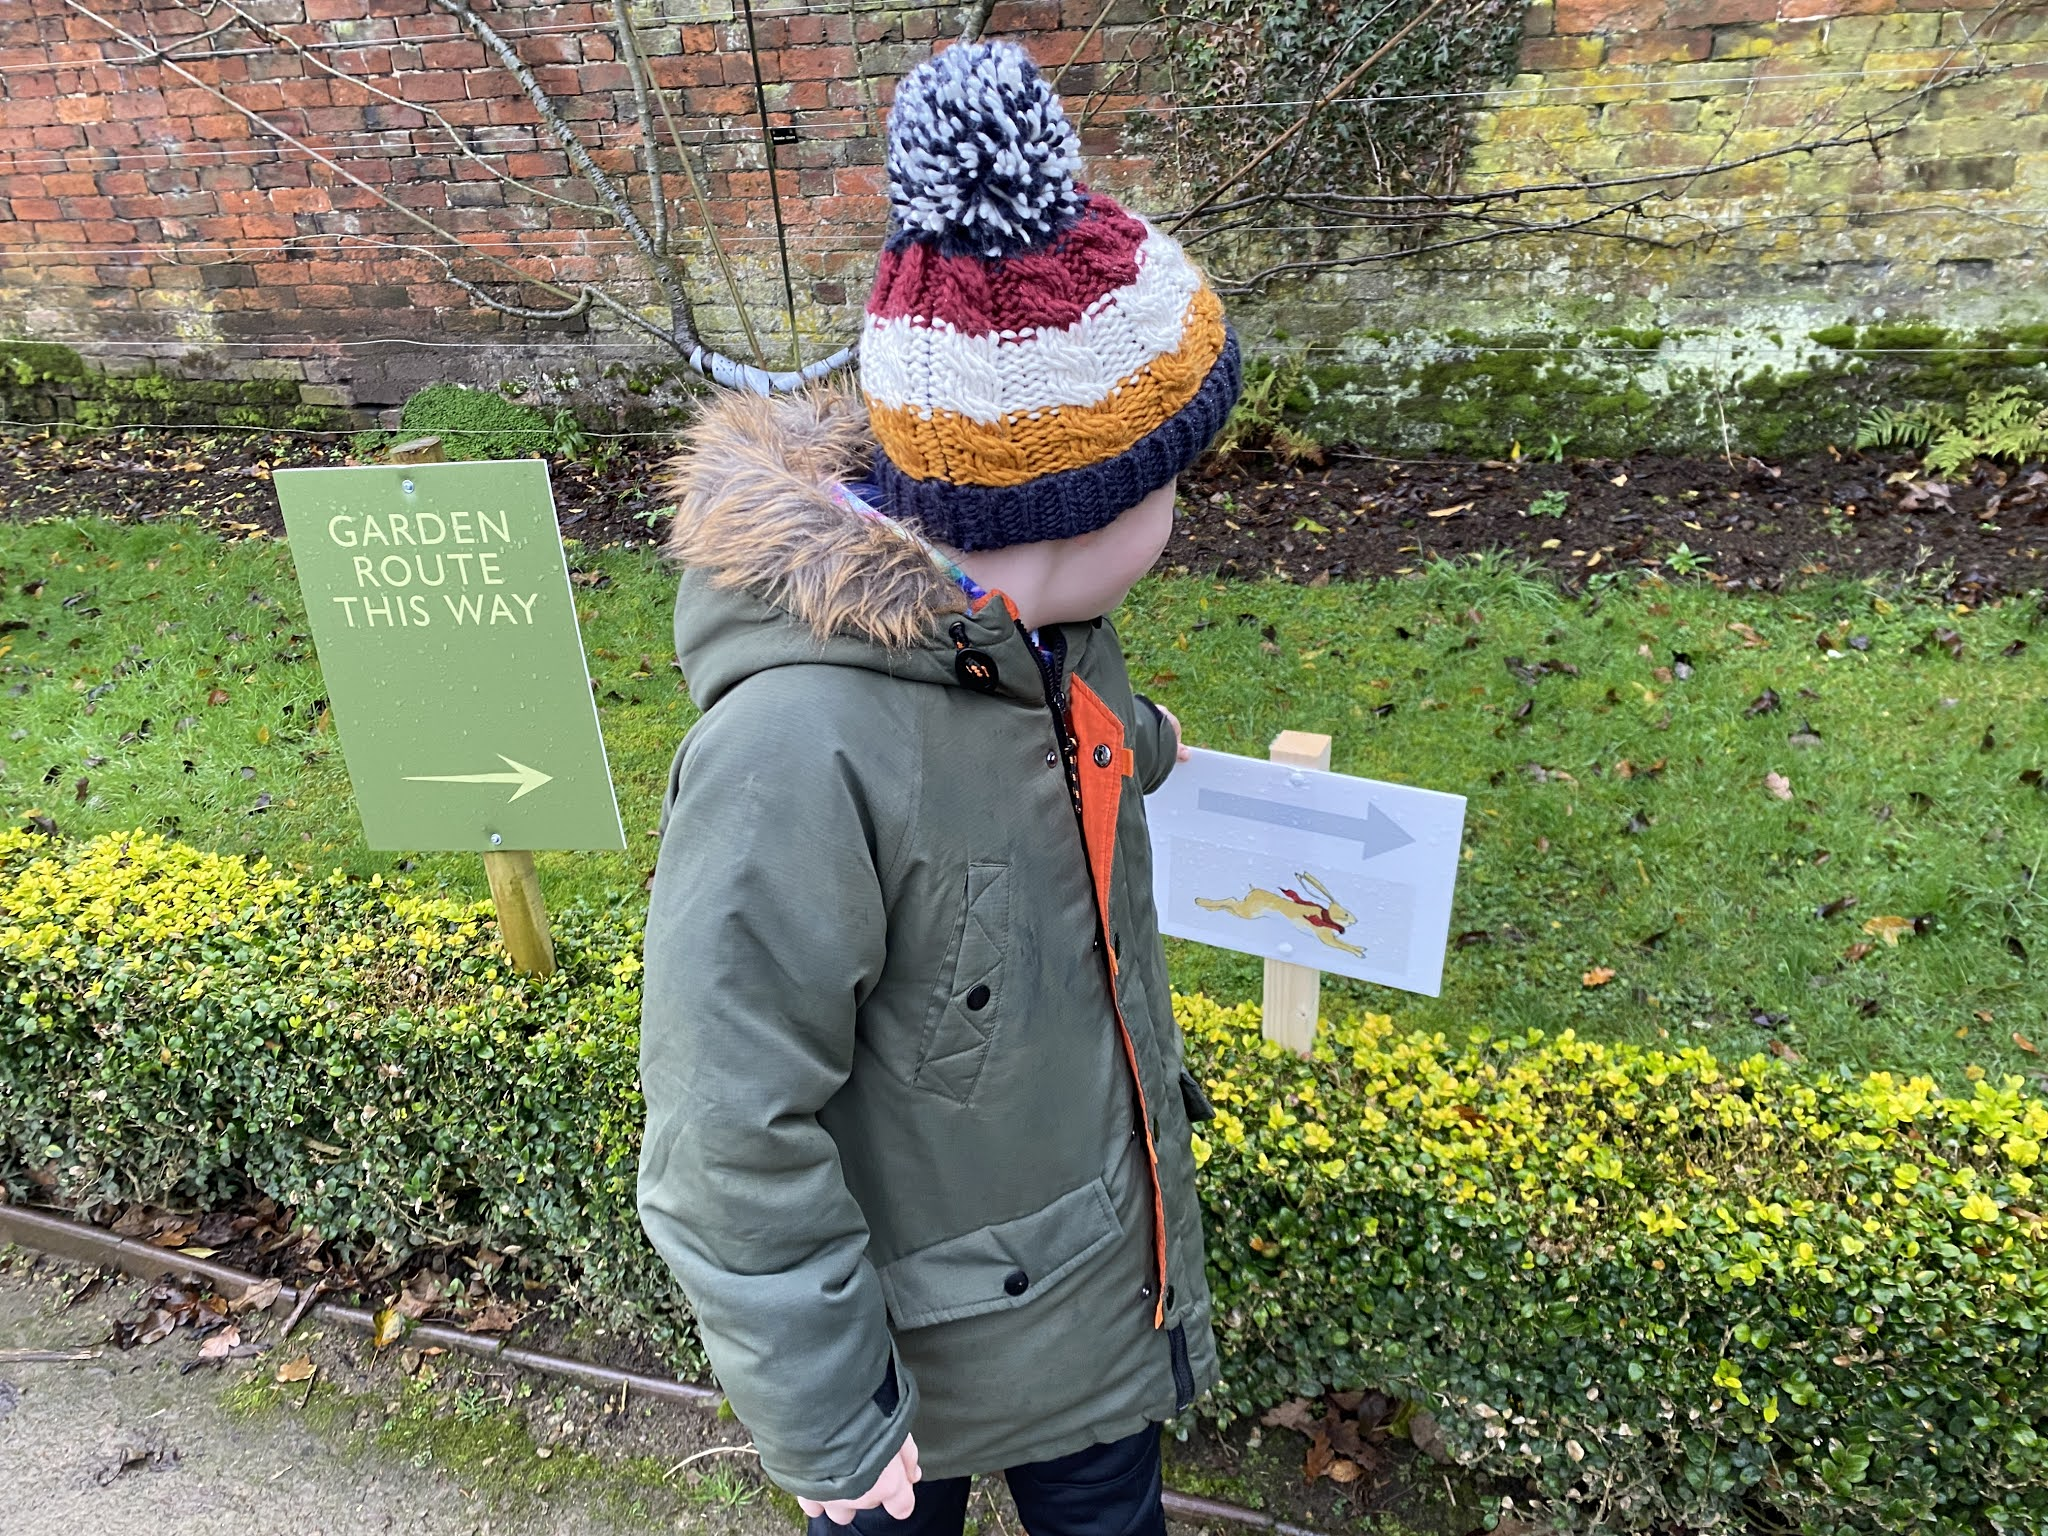 boy looking at an arrow sign